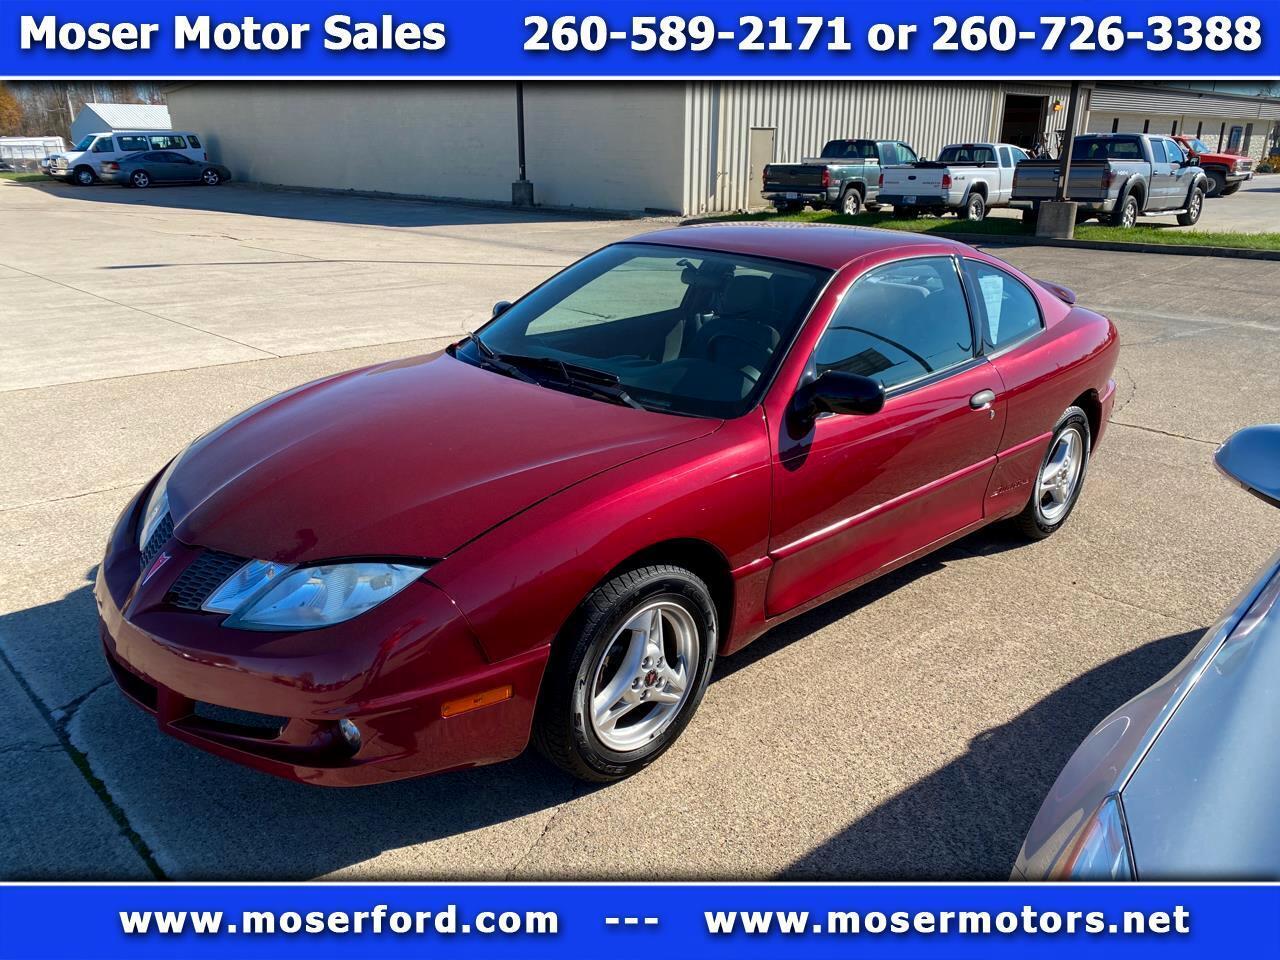 Used Pontiac Sunfire For Sale Carsforsale Com